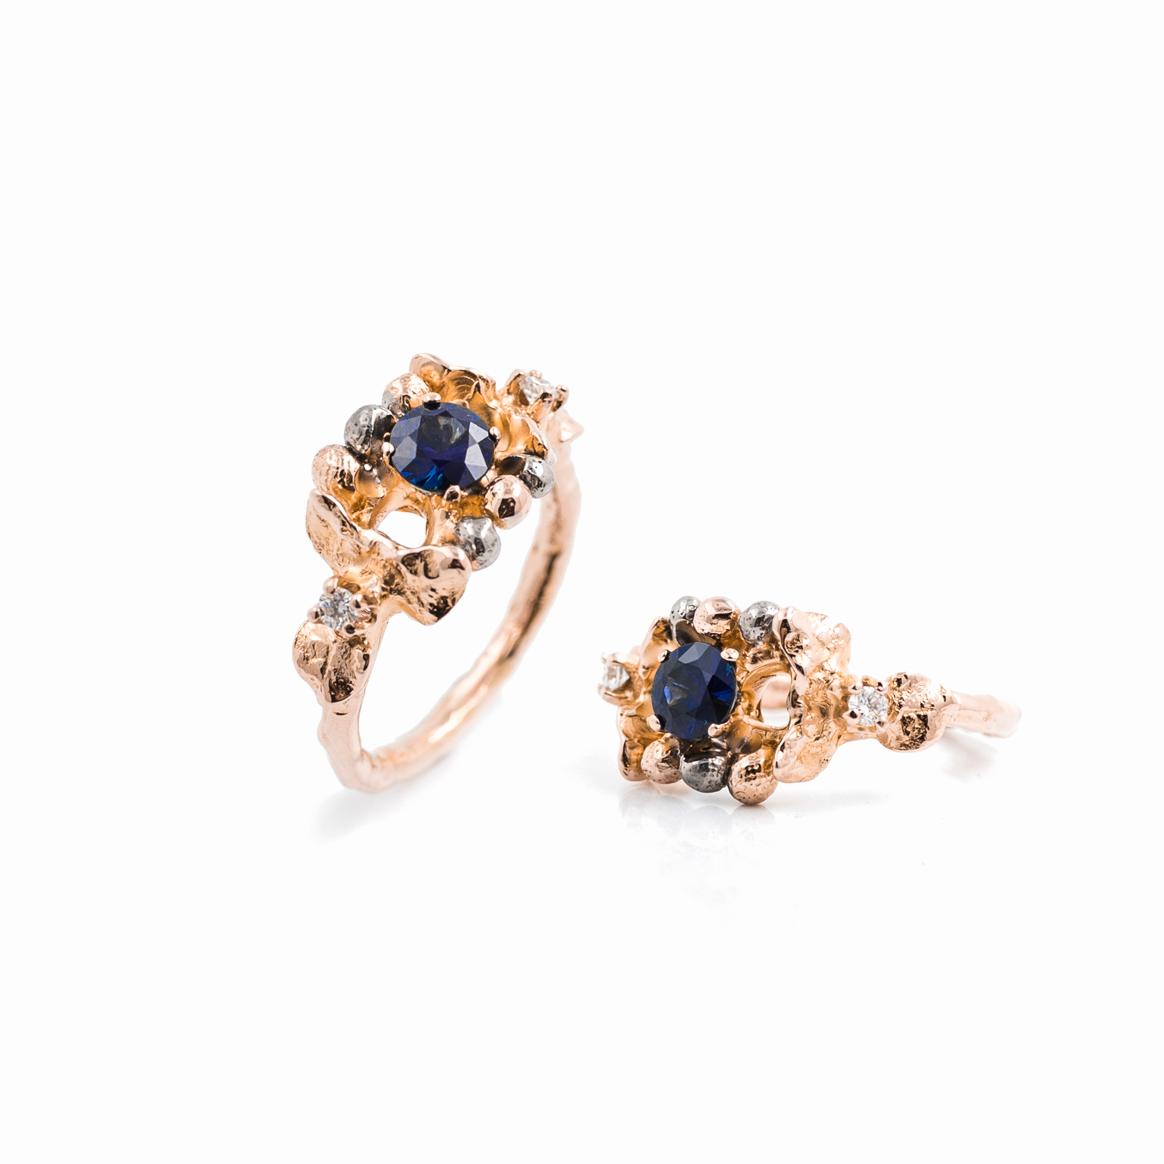 November Ring | 18ct rose gold, blue sapphire, white diamonds.